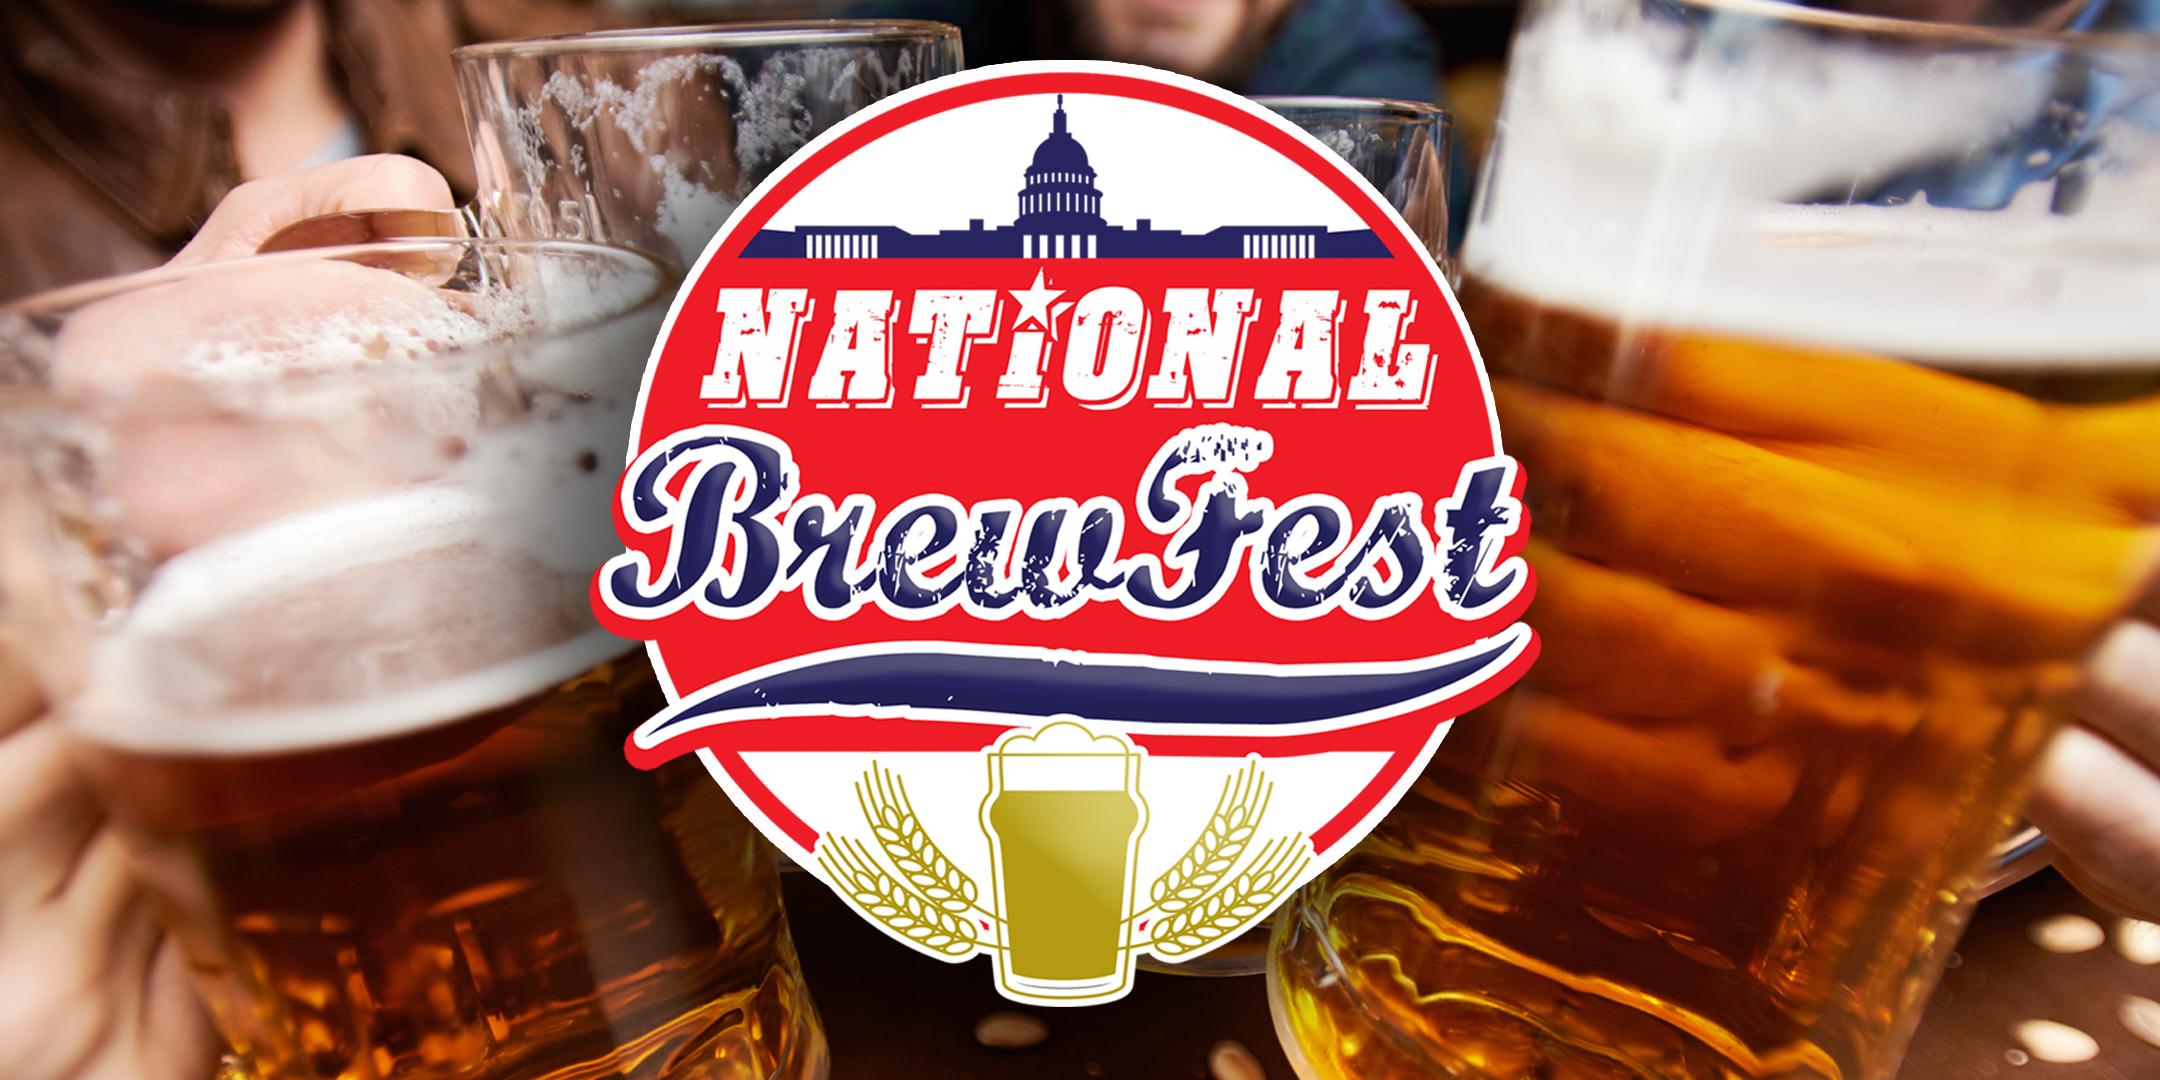 NATIONAL BREW FEST